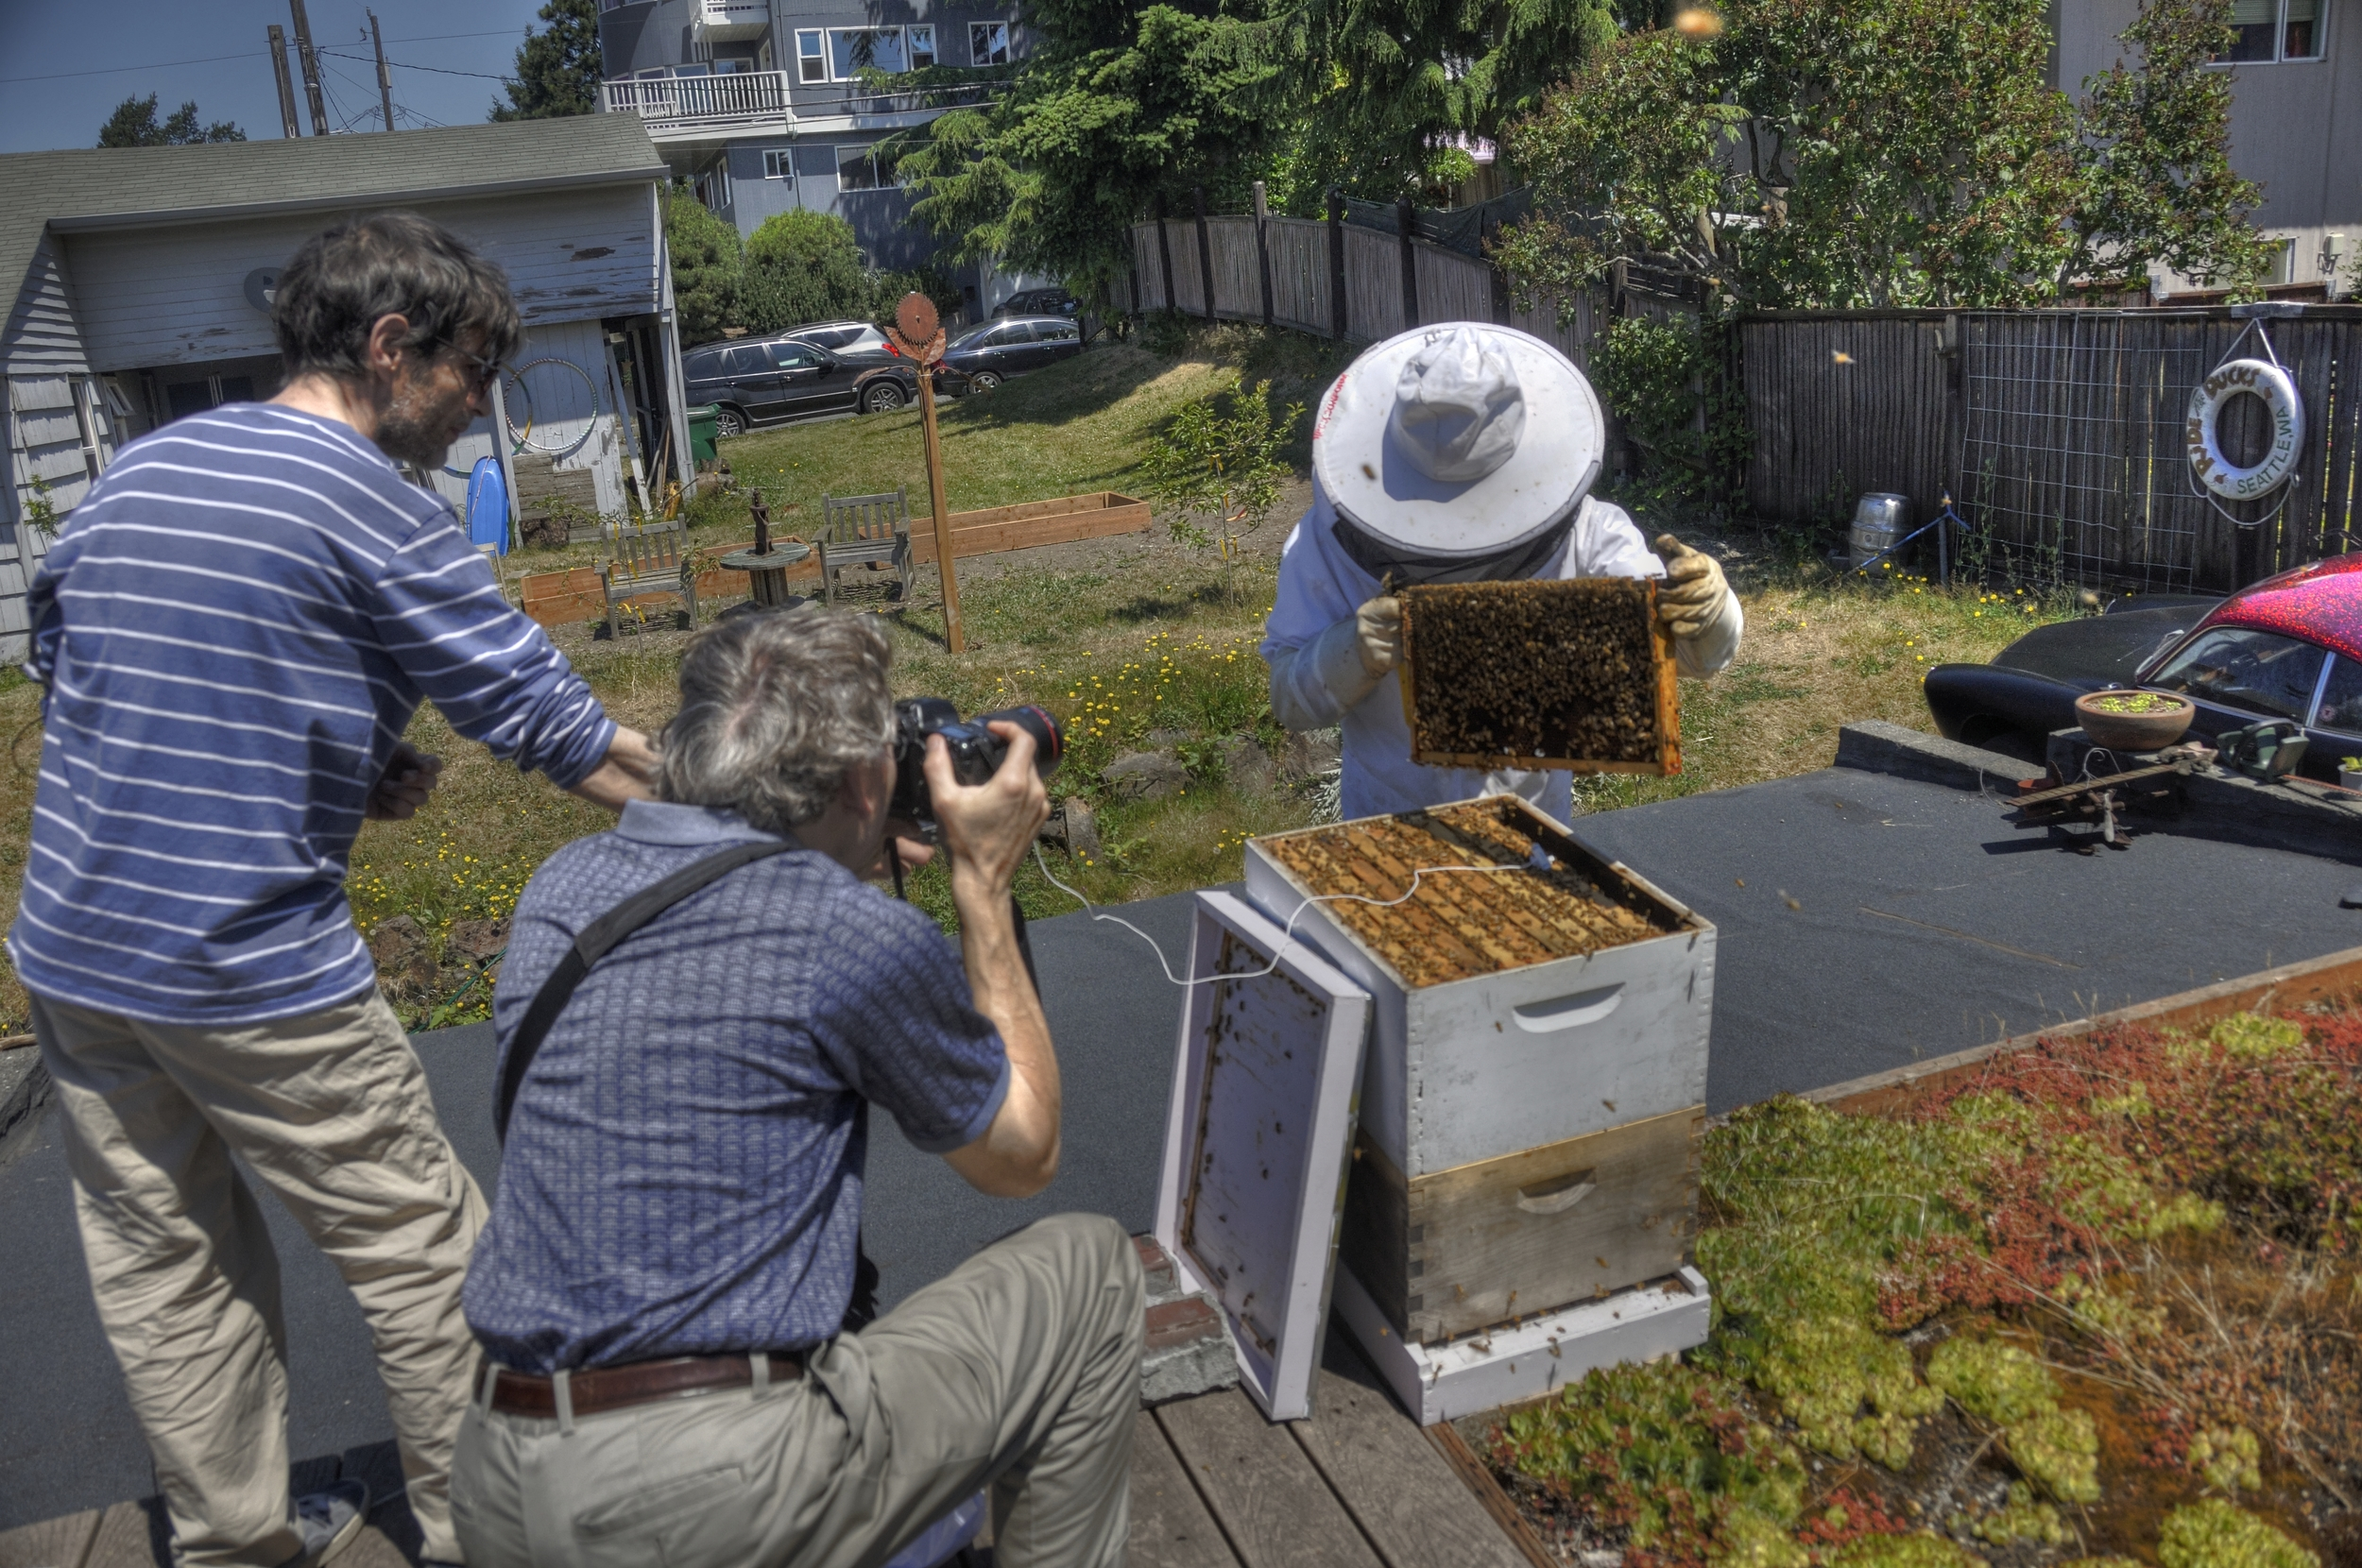 Bee action shot